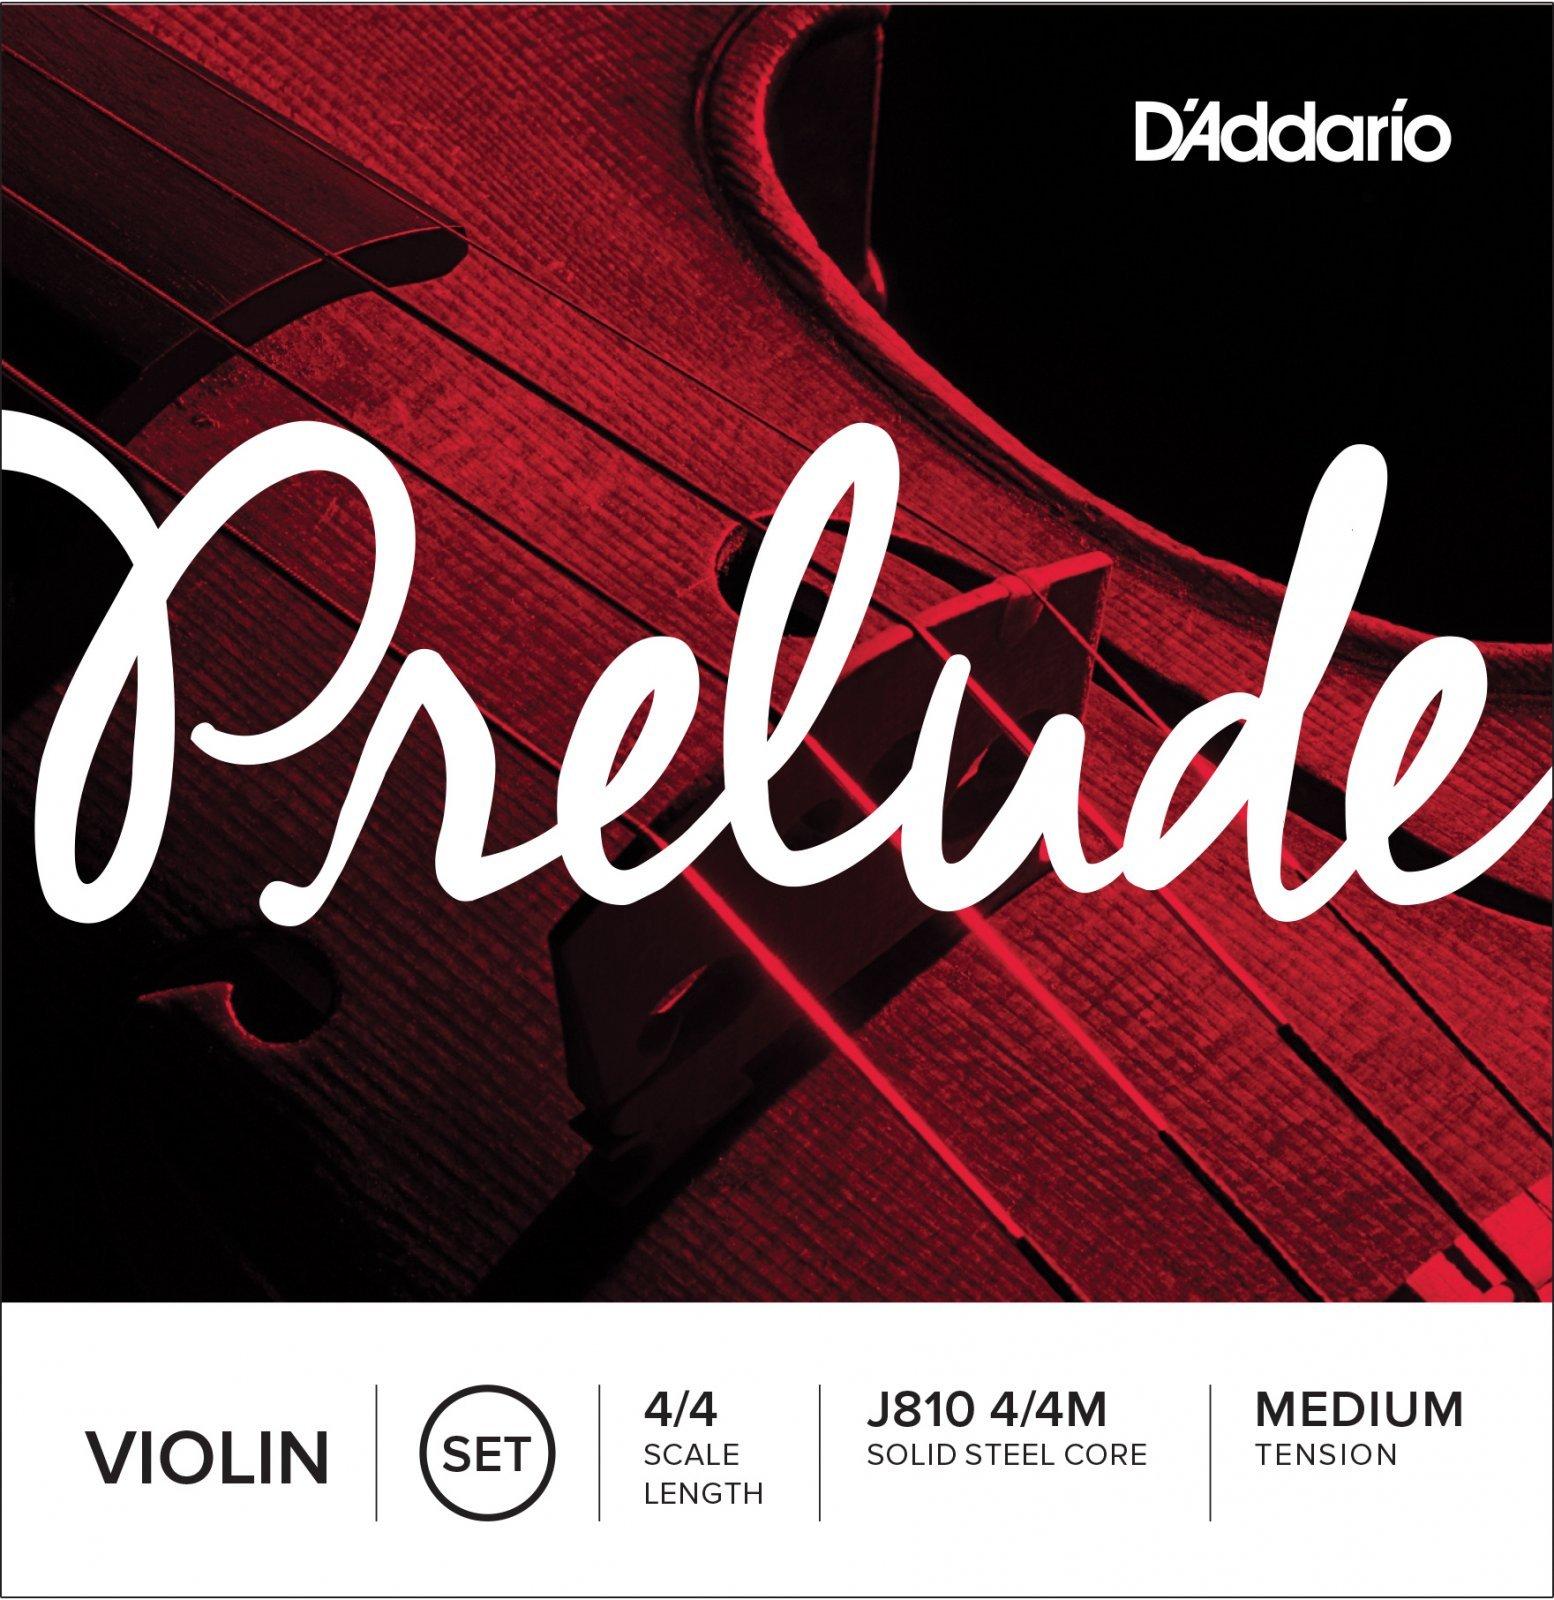 Prelude Violin Set 4/4